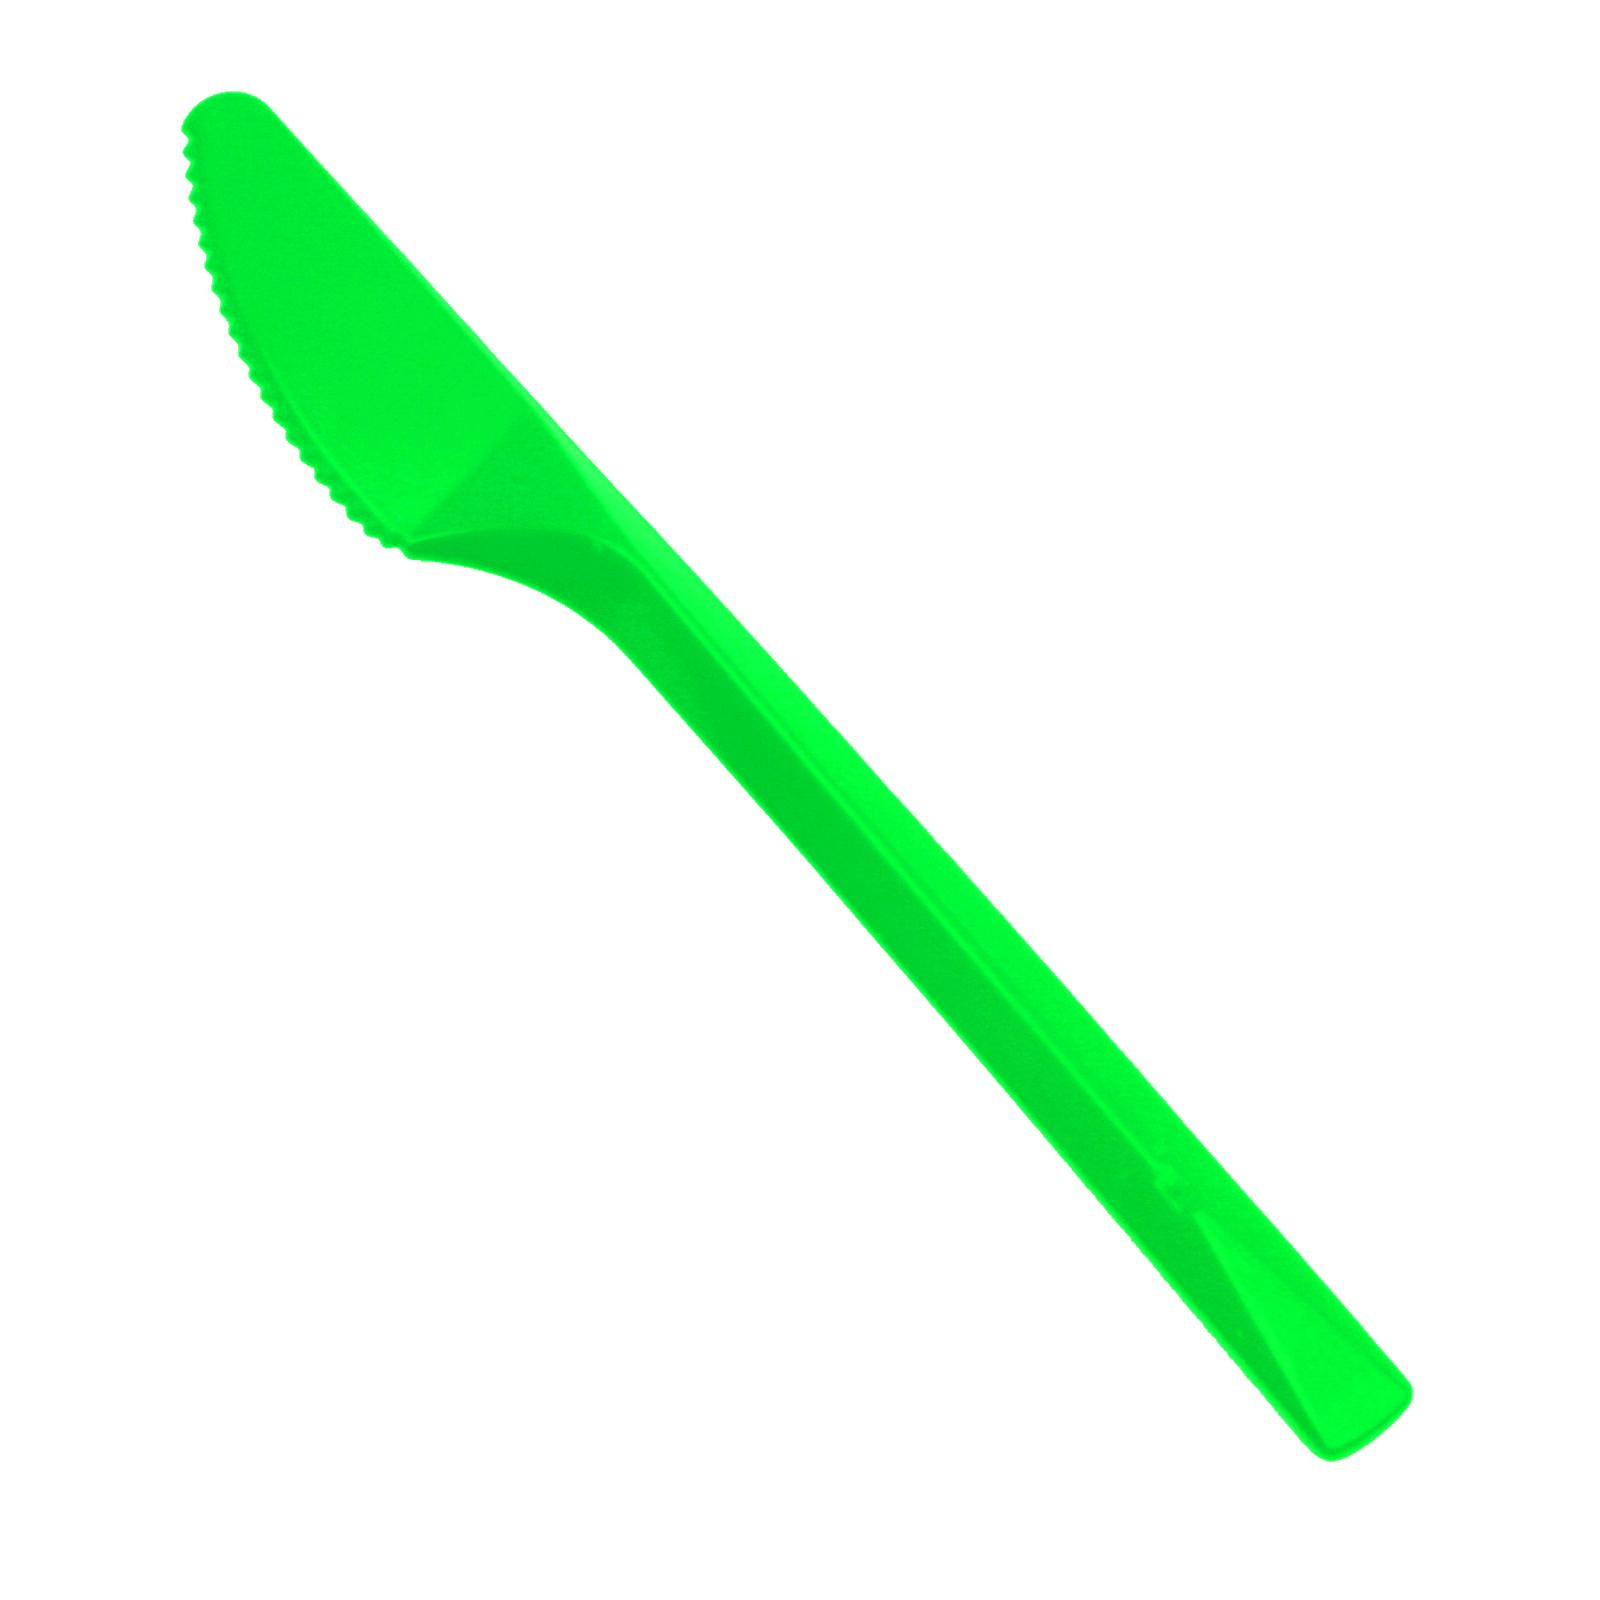 20 Party-Messer Plastik grün